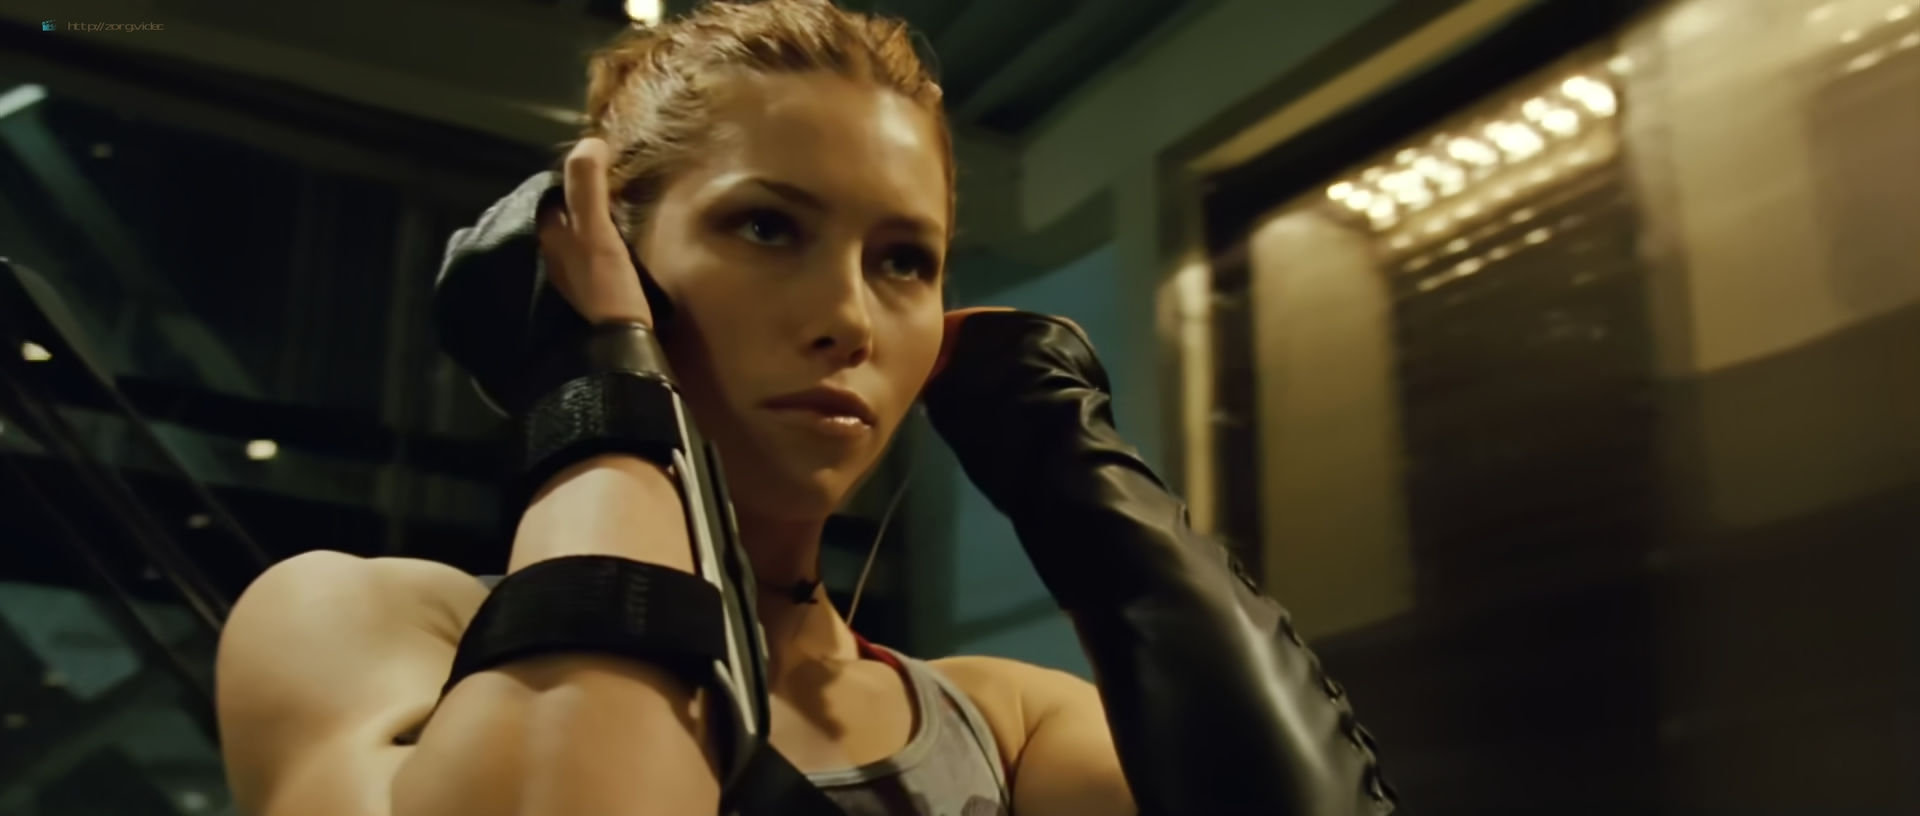 Jessica Biel hot and sexy - Blade Trinity (2004) HD 1080p BluRay (7)